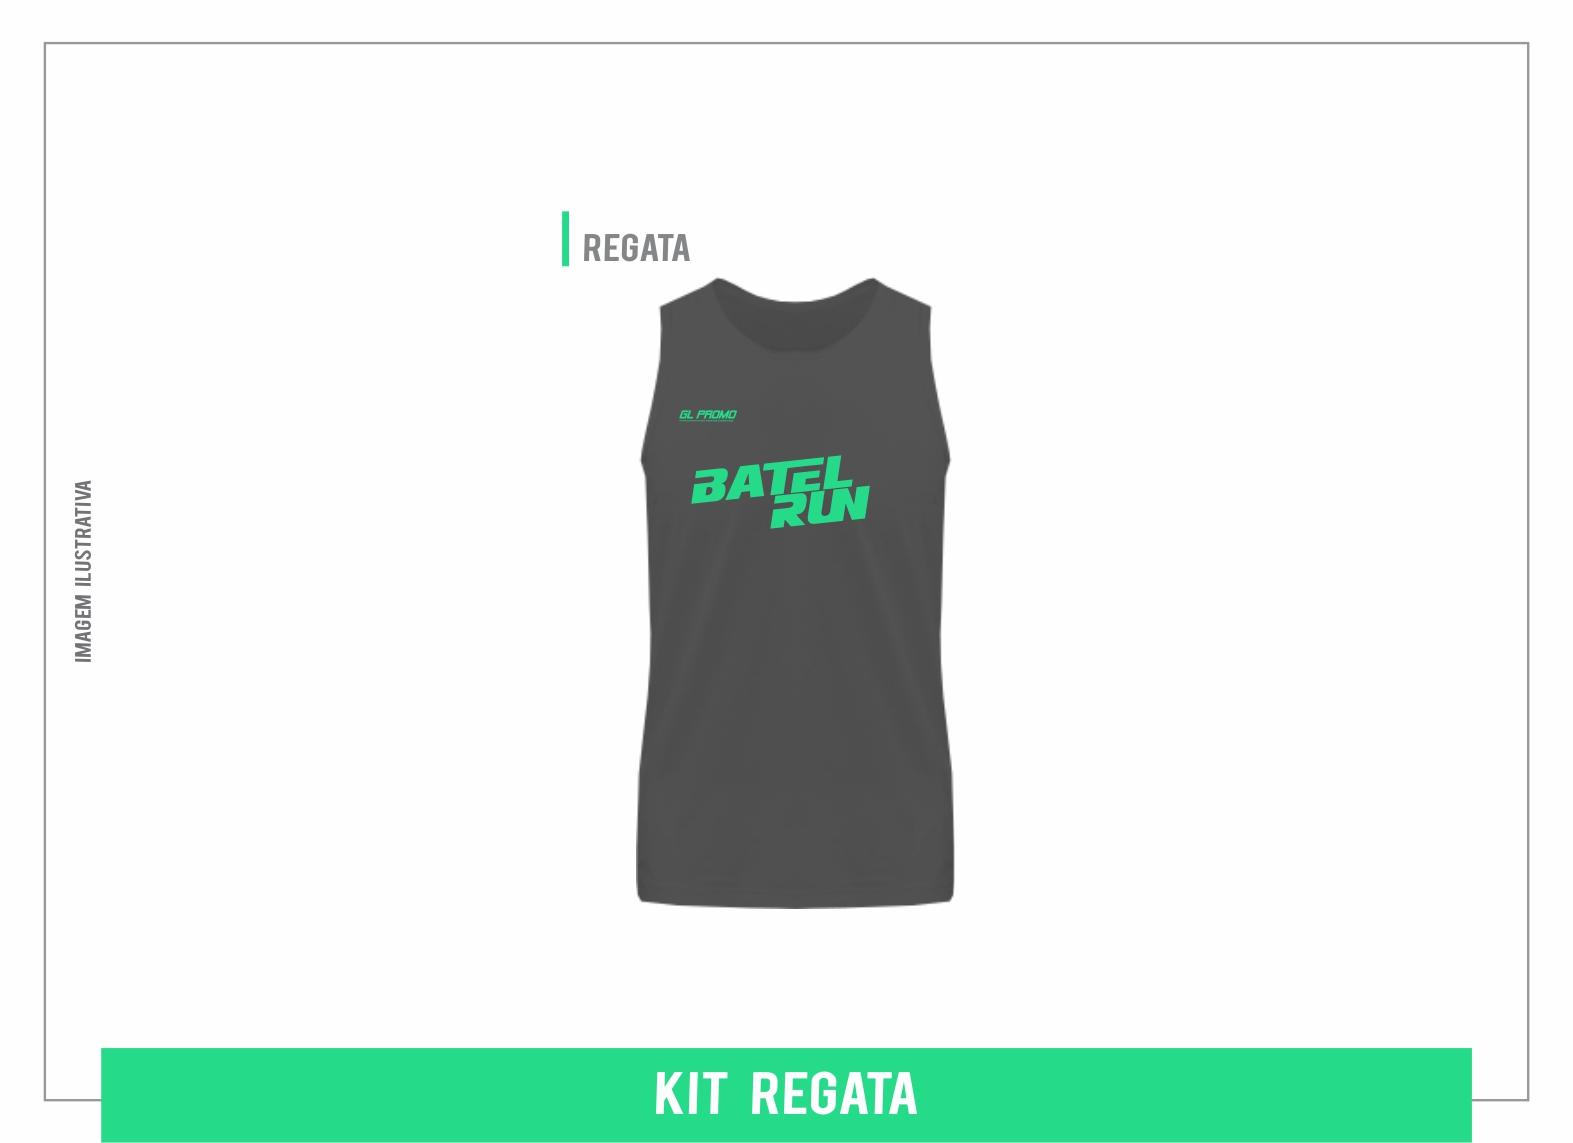 Kits Batel Run